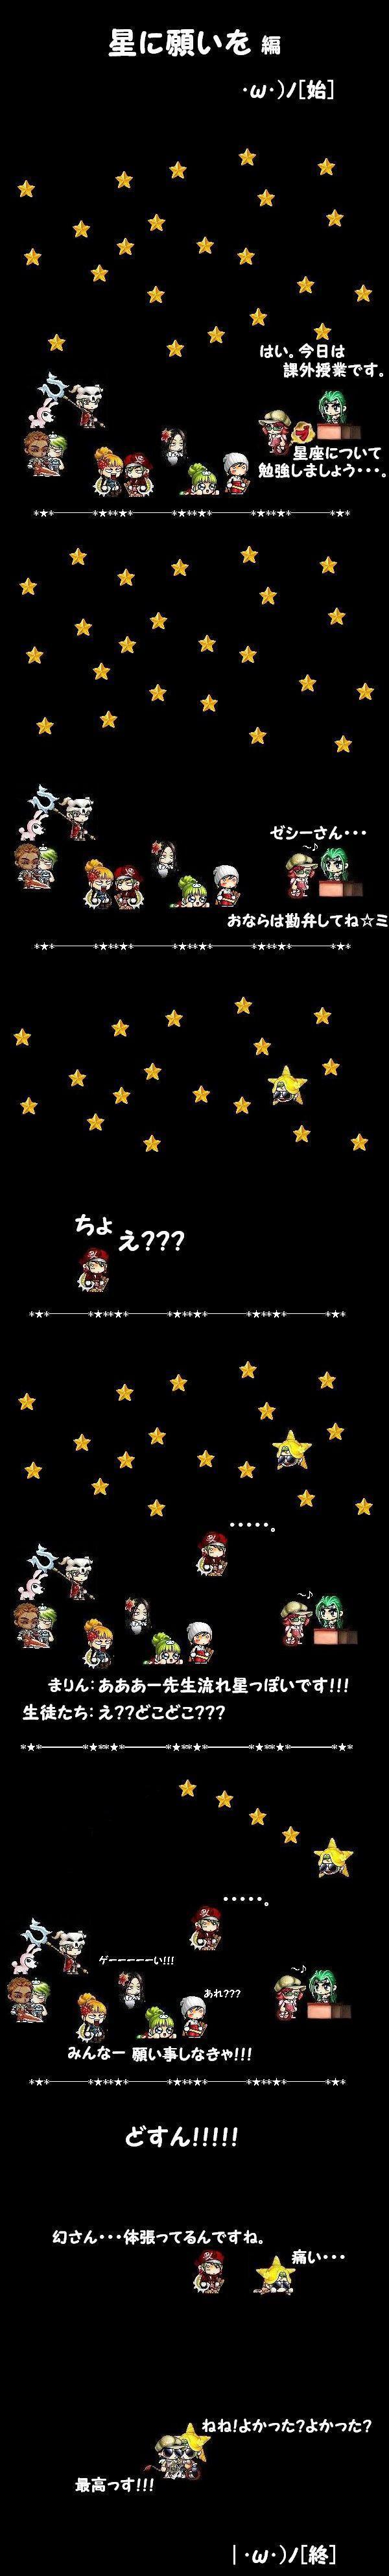 11gatu21hi.jpg